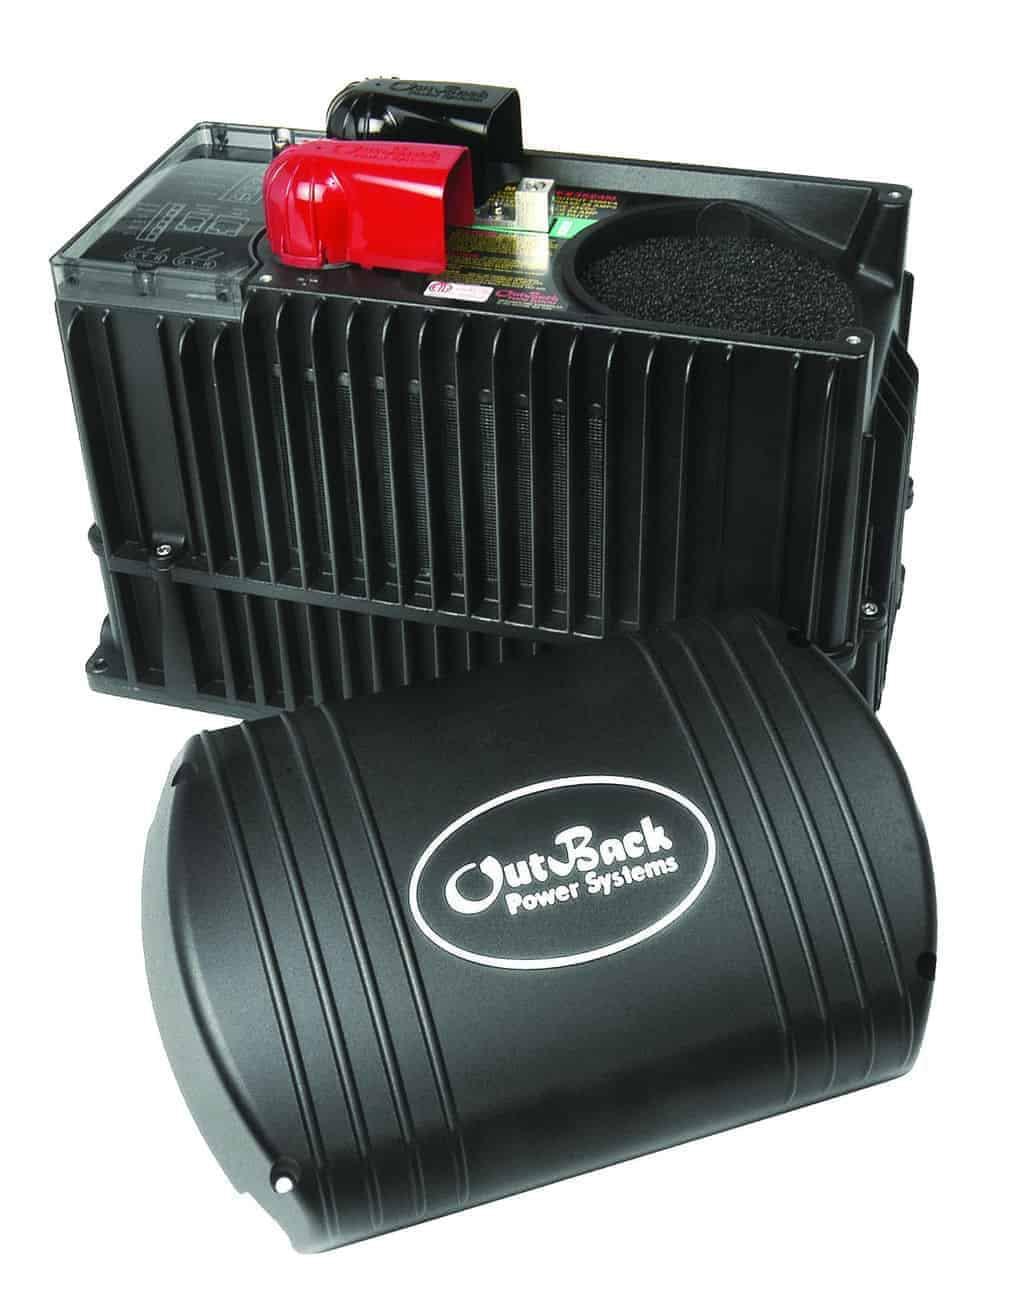 Outback Power VFXR3524A-01 Inverter